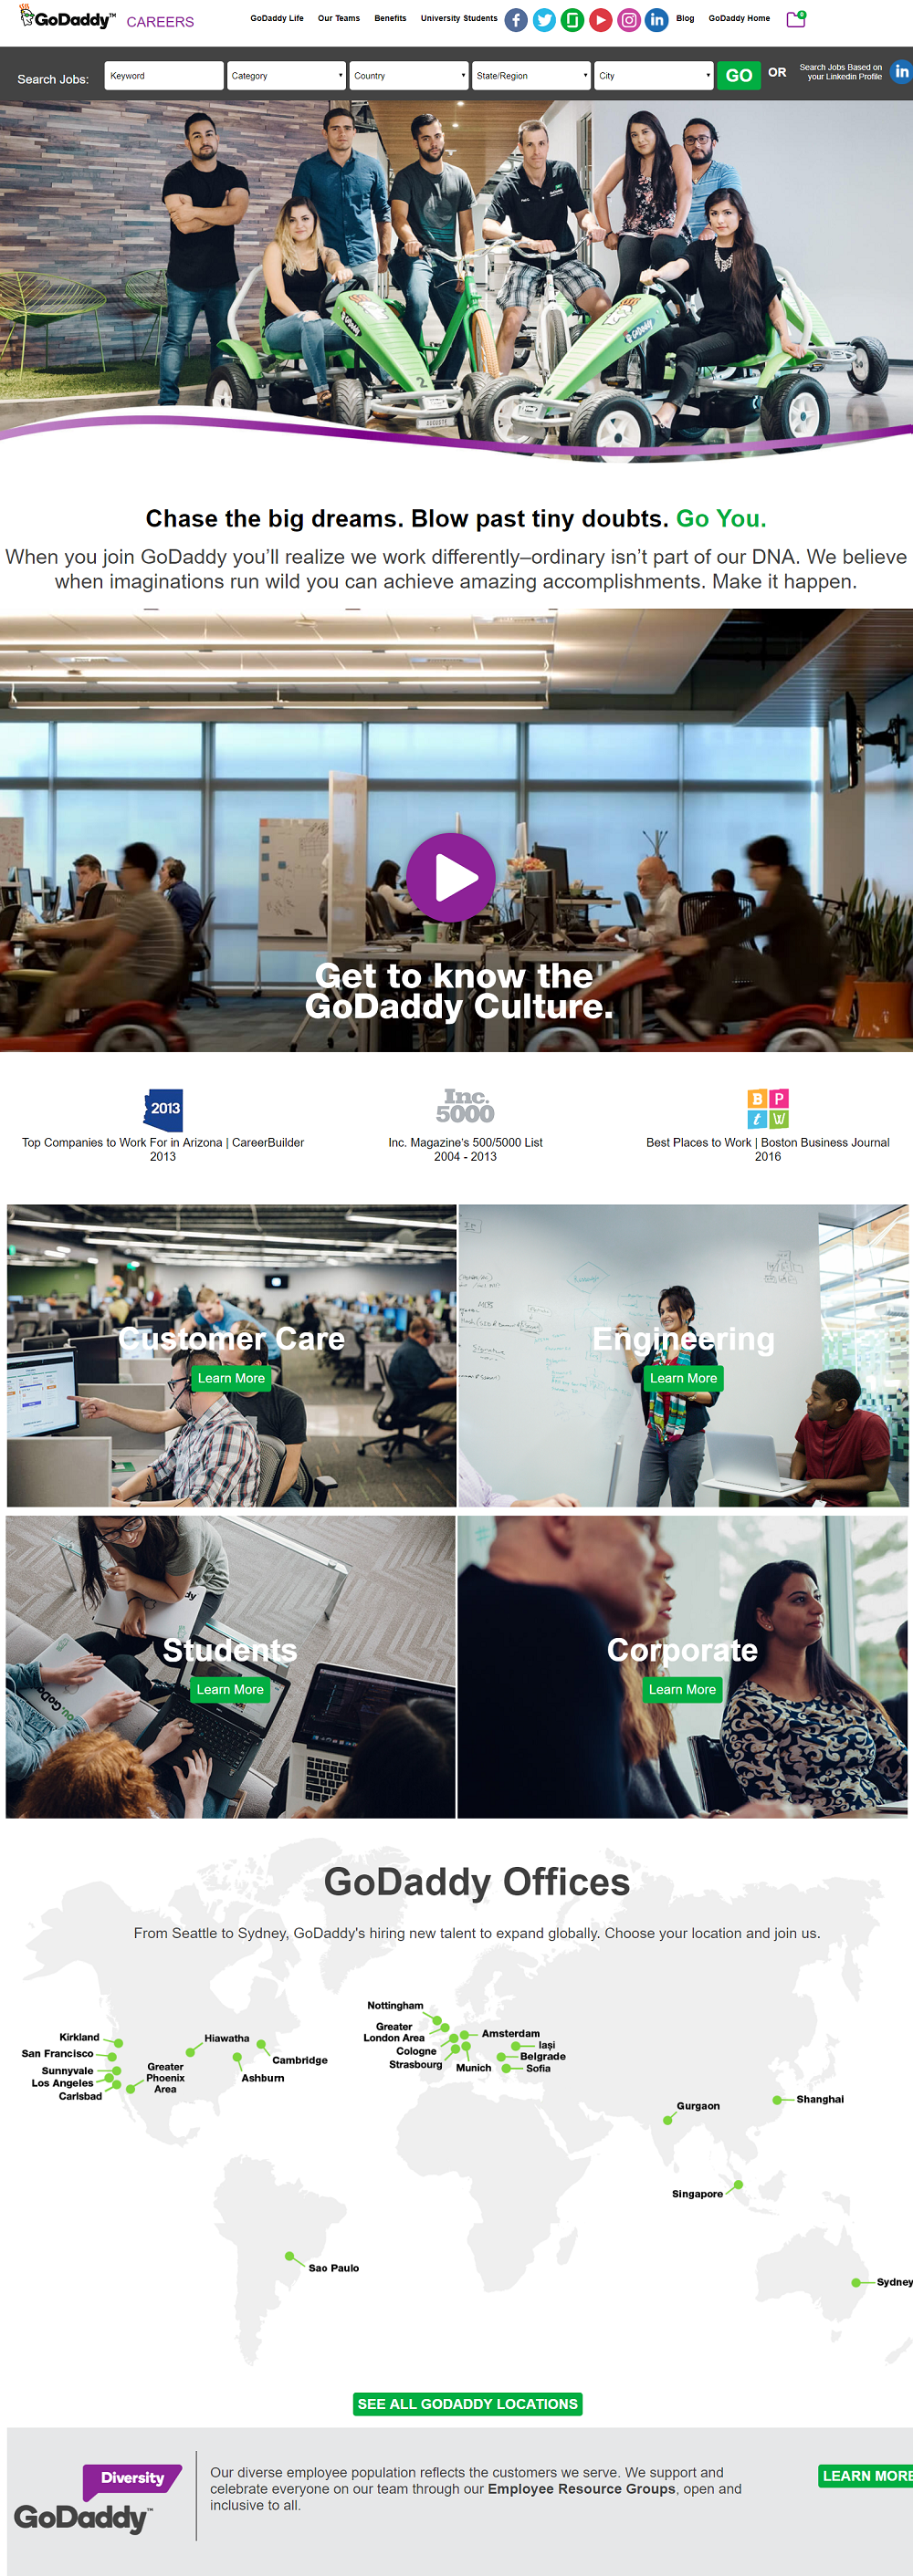 GoDaddy Company Career Page